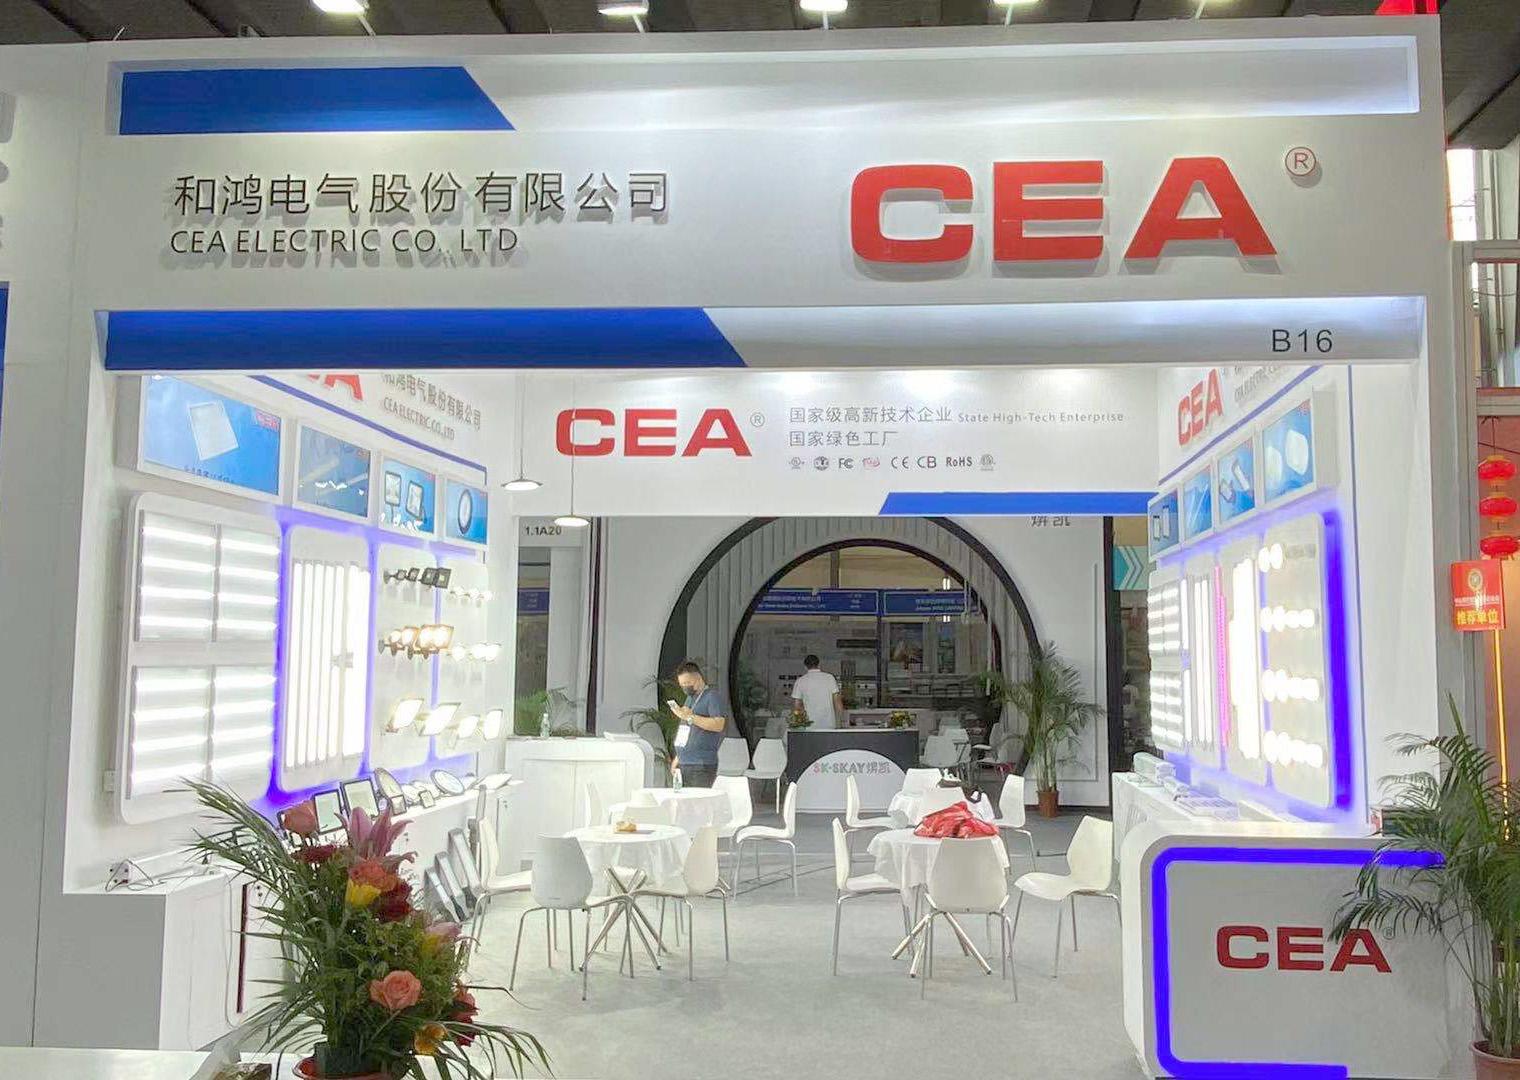 CEA in 2021 Guangzhou Lighting fair international